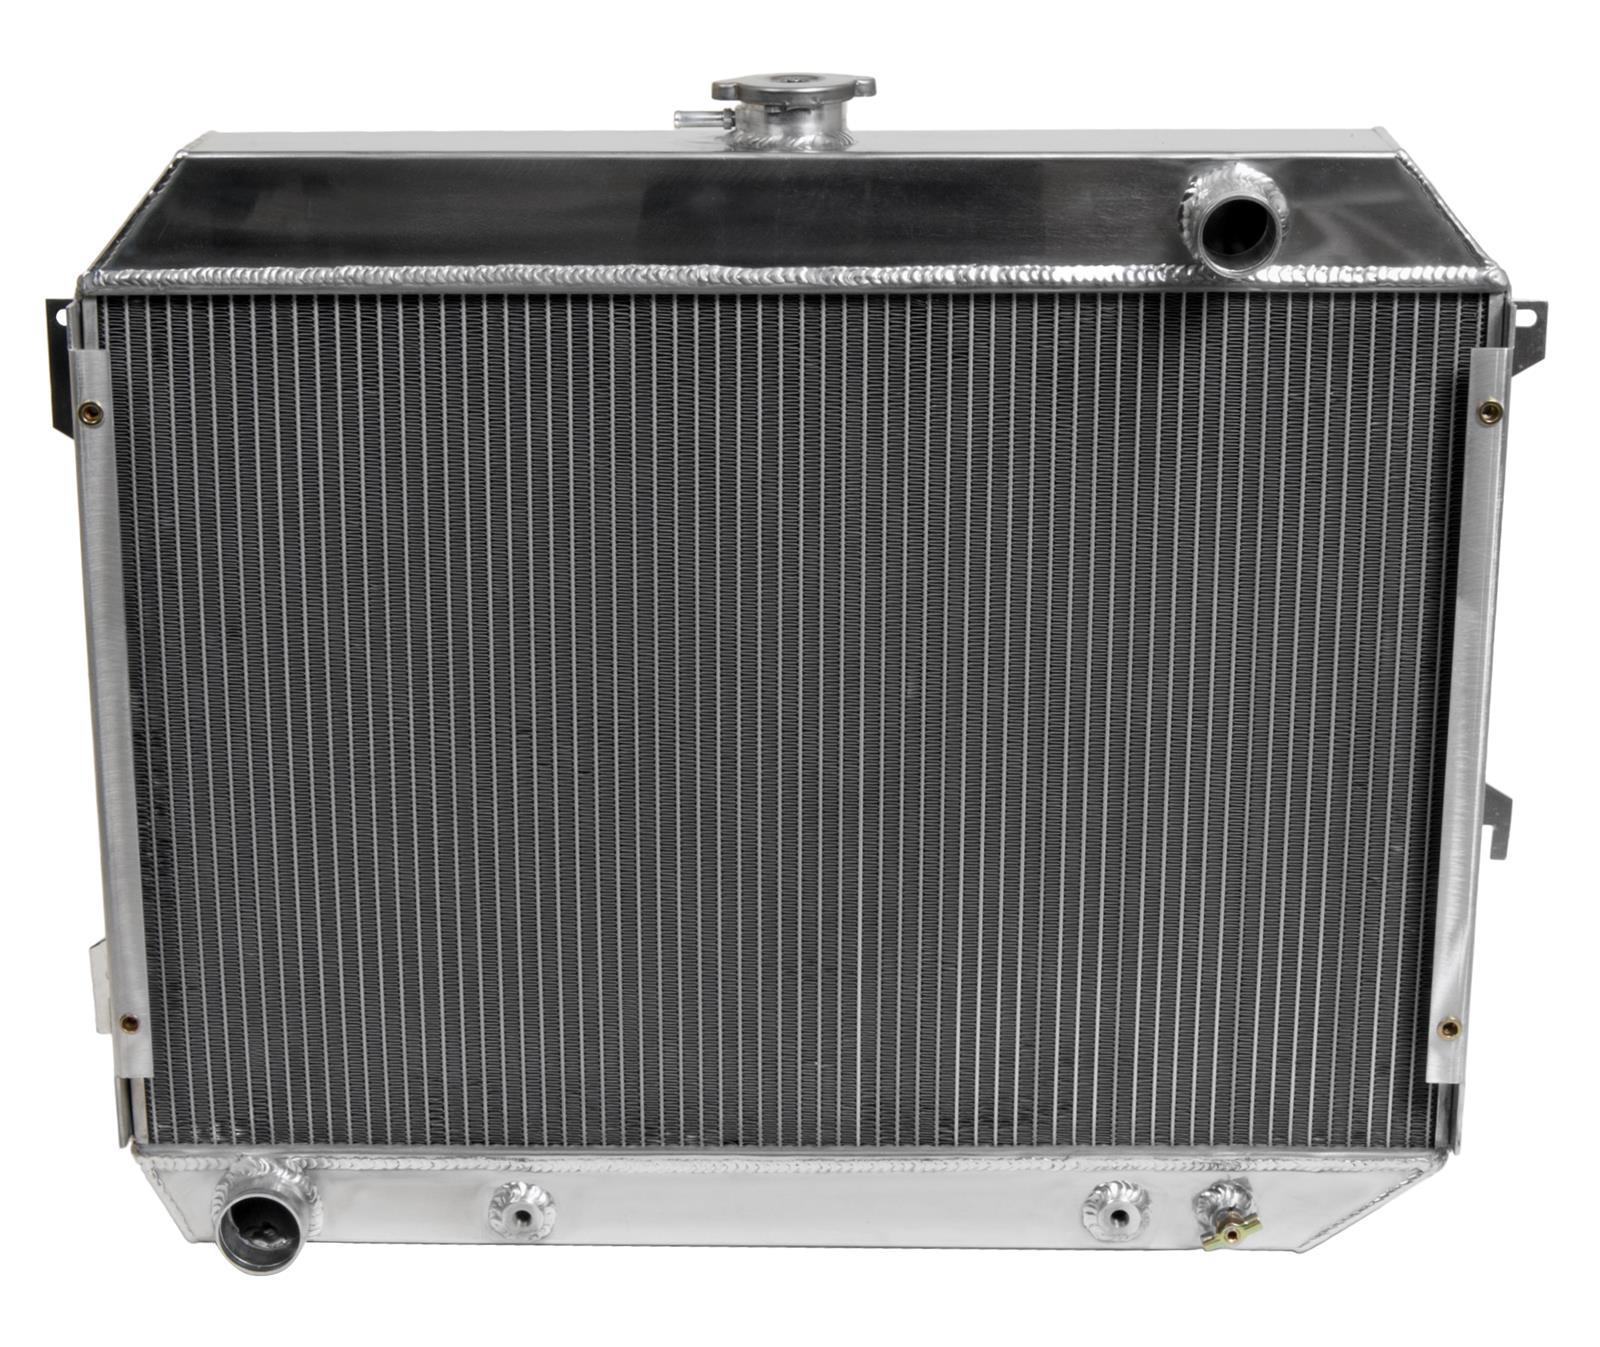 1969 DODGE CHARGER Summit Racing® Performance Fit Aluminum Radiators  SUM-384021